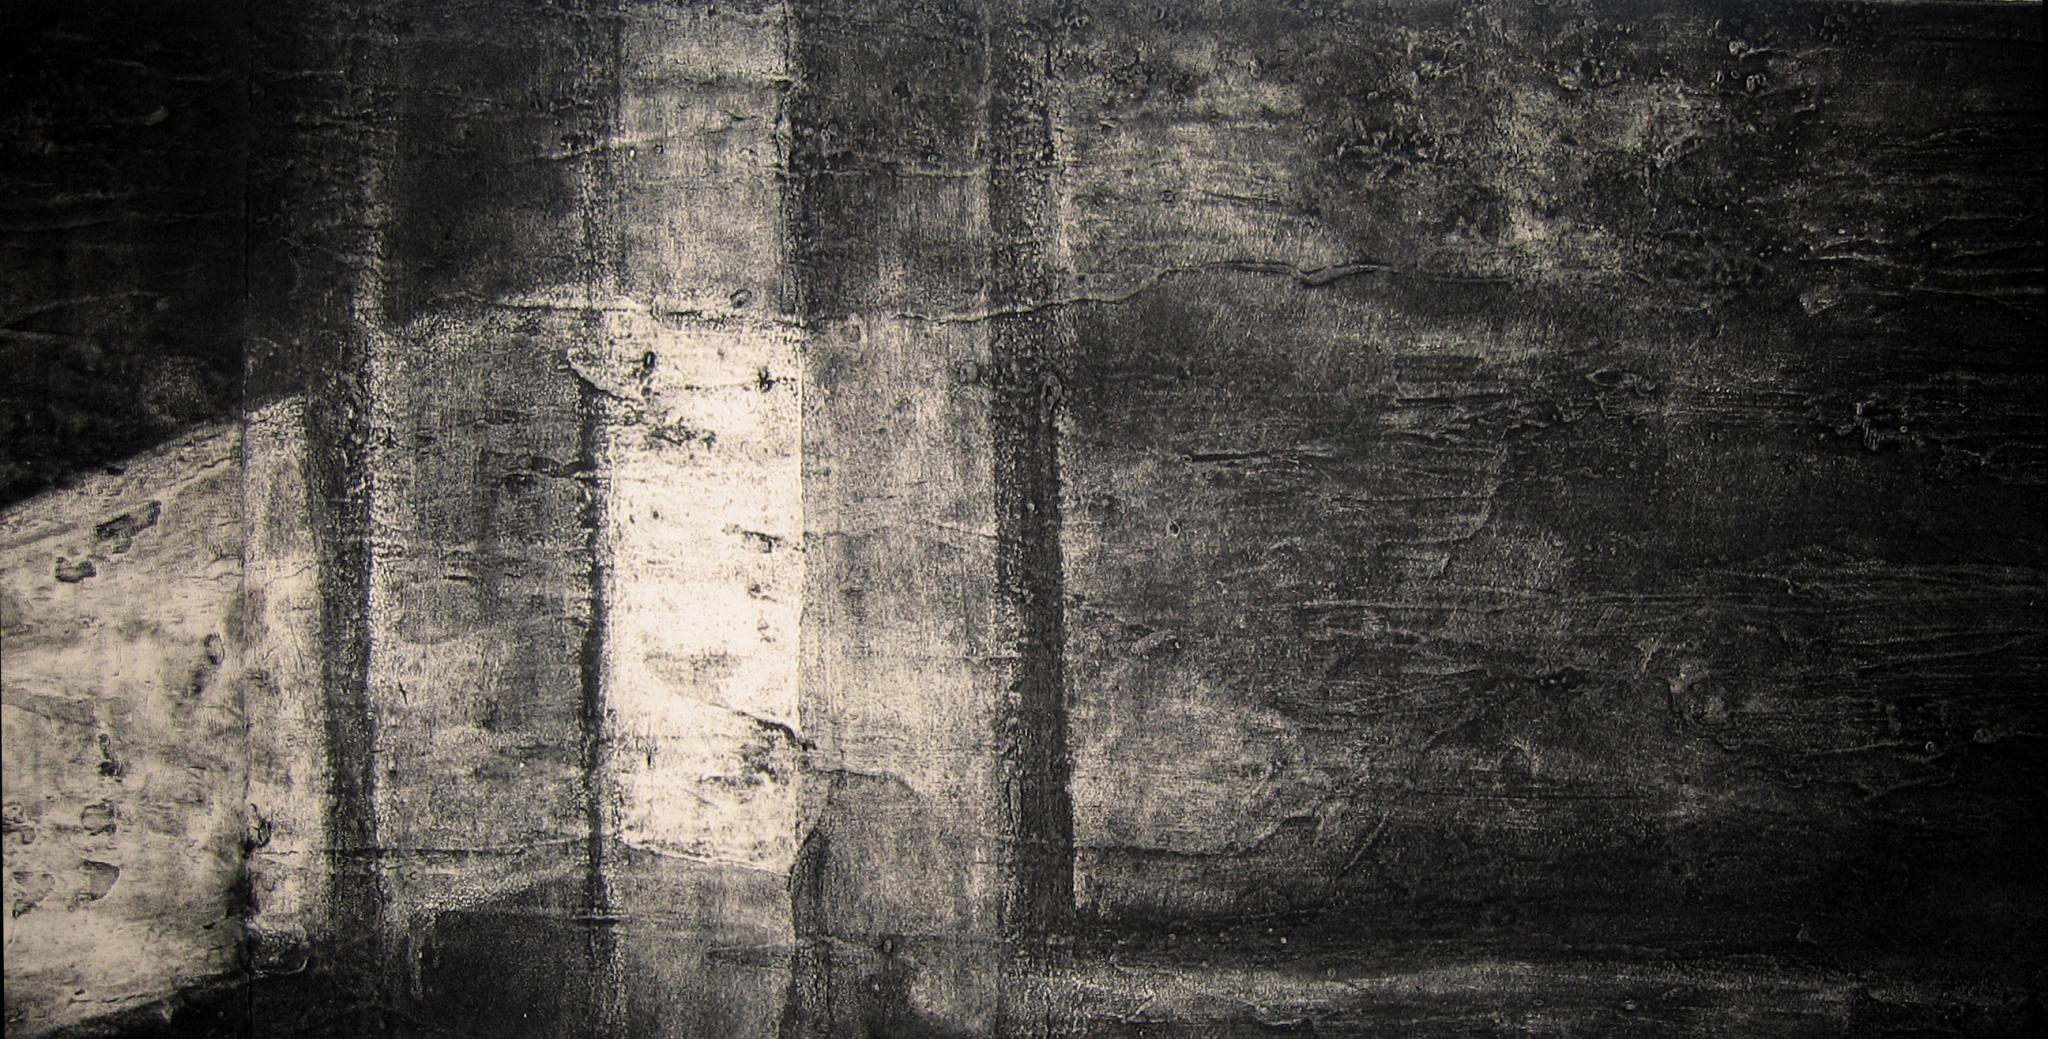 Five Meditations on Longing - III, detail